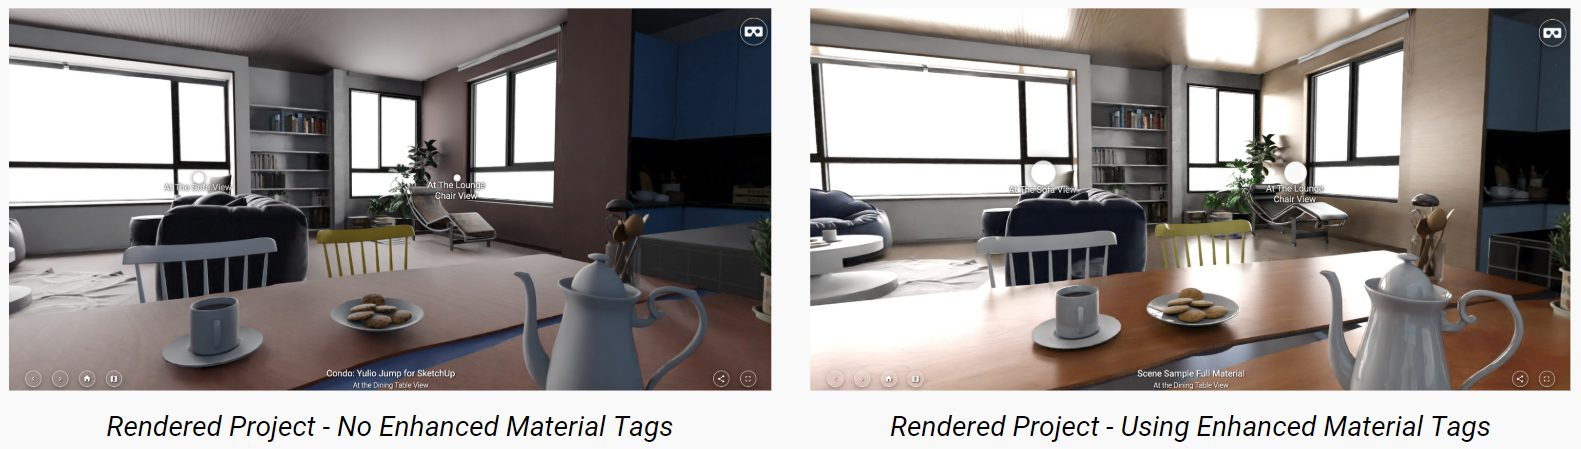 Material tags comparison